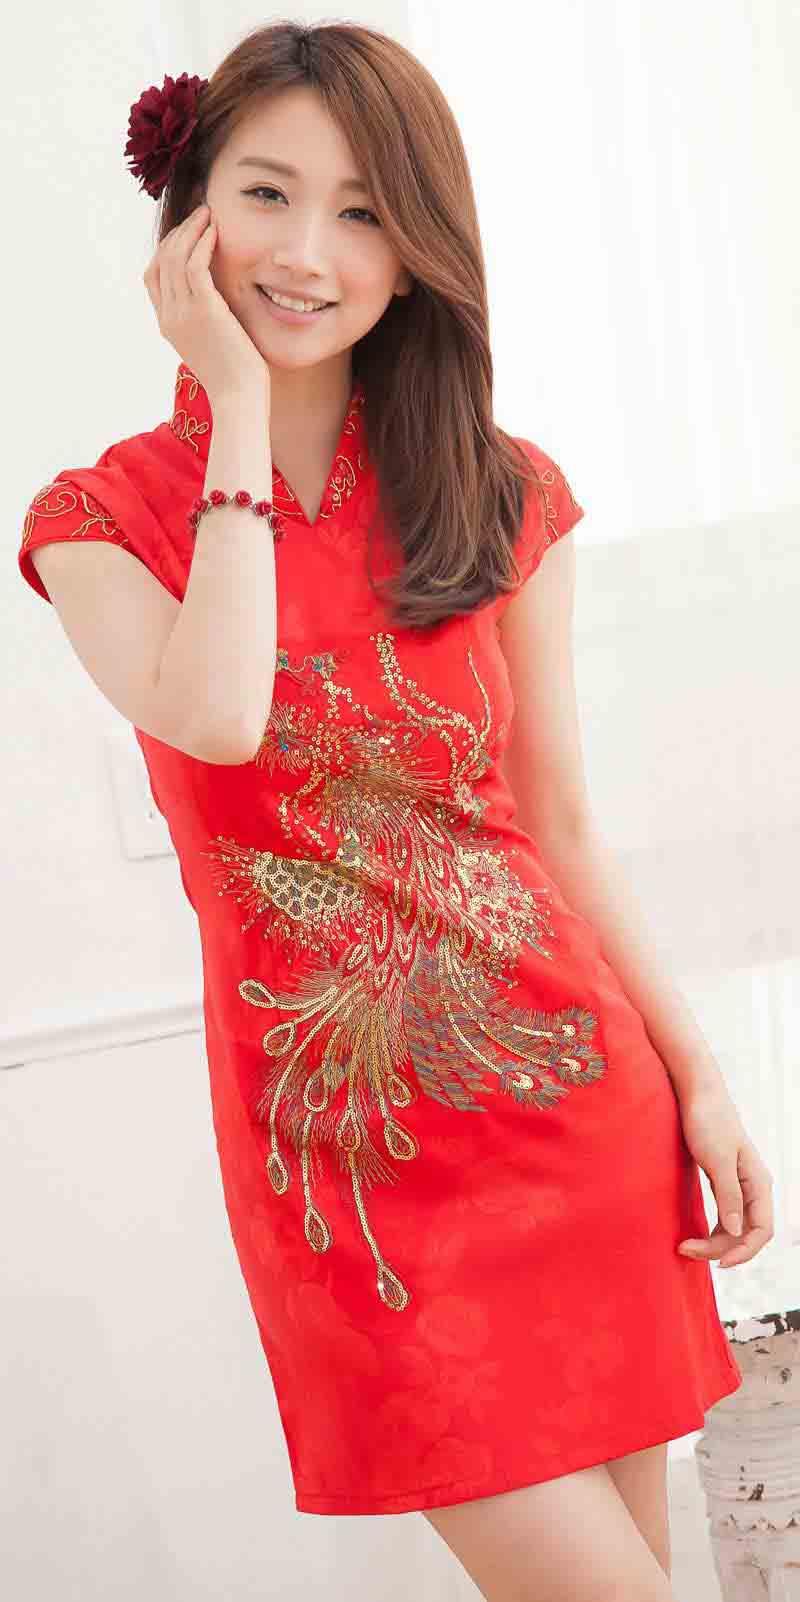 JUAL BAJU DRESS CHEONGSAM WANITA IMLEK 2014